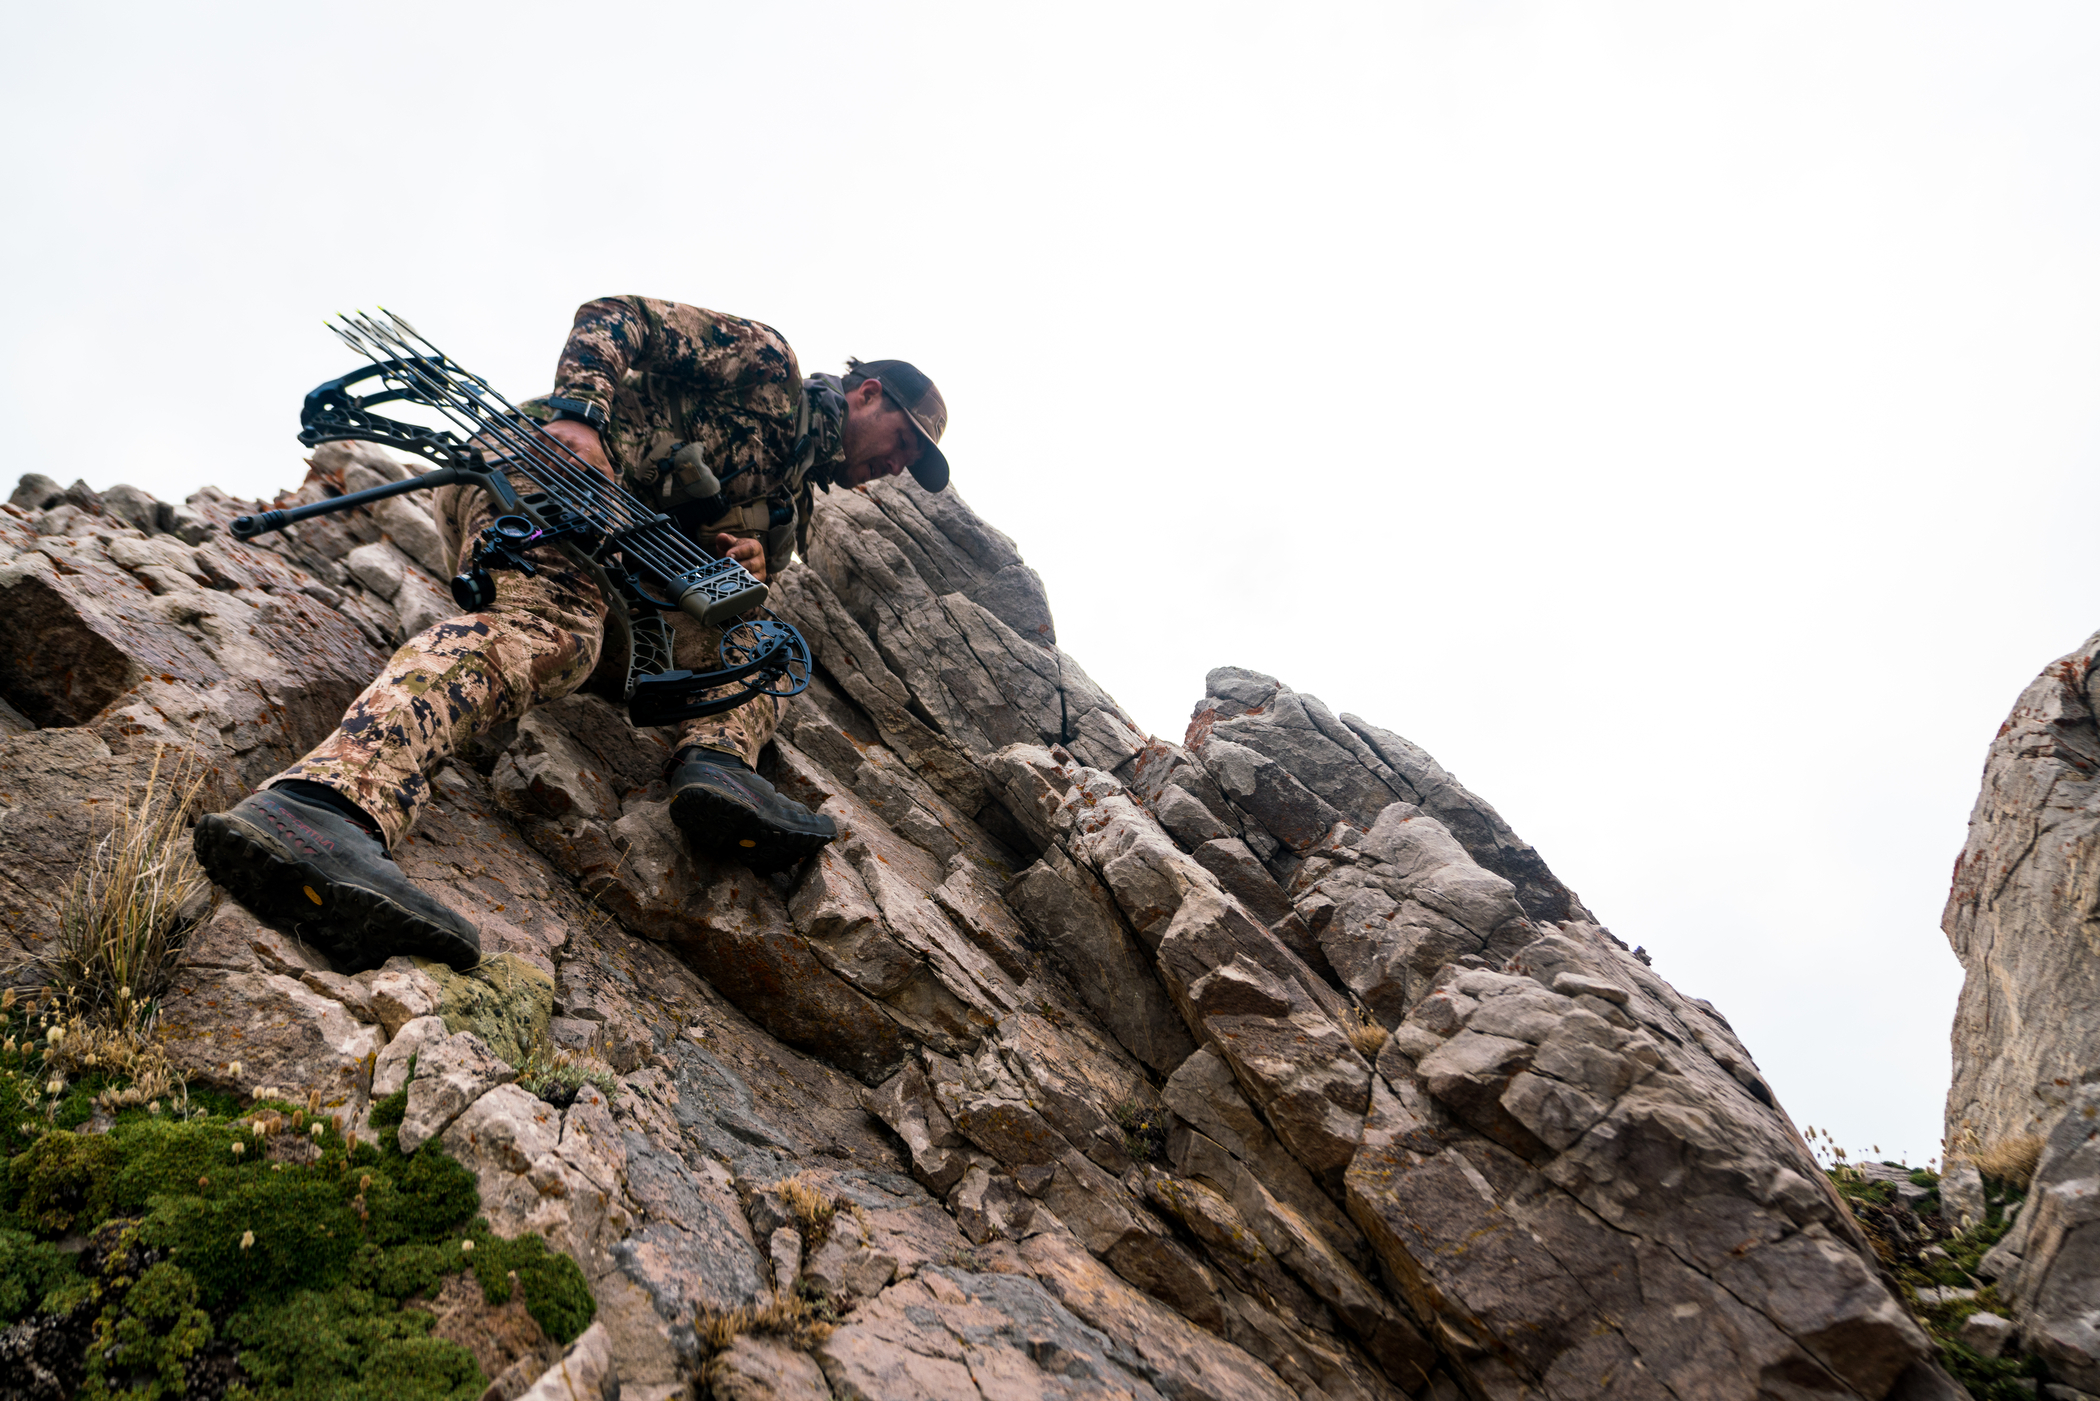 brett seng climbing across rocks with his hunting bow in camo